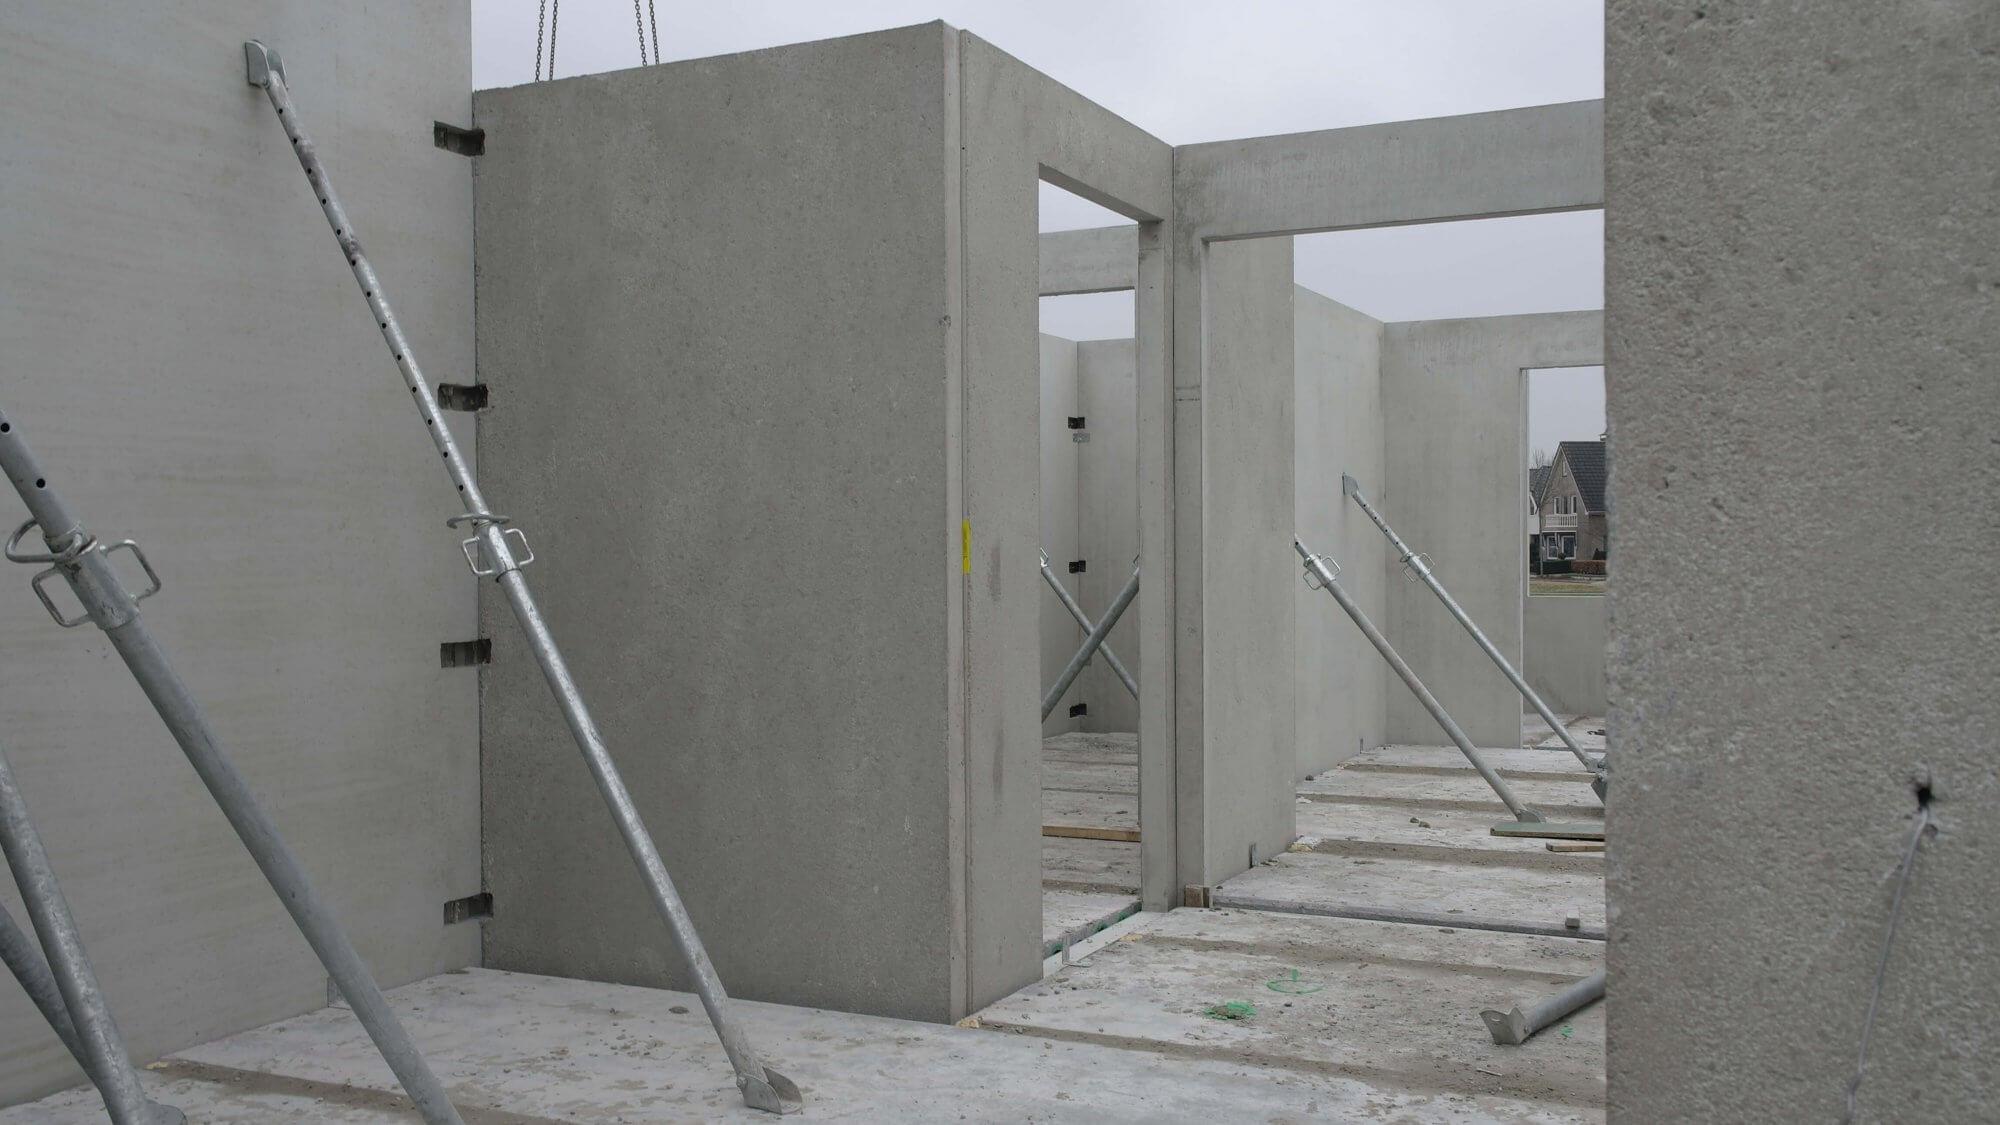 prefab woning laten bouwen - prefab bouwen